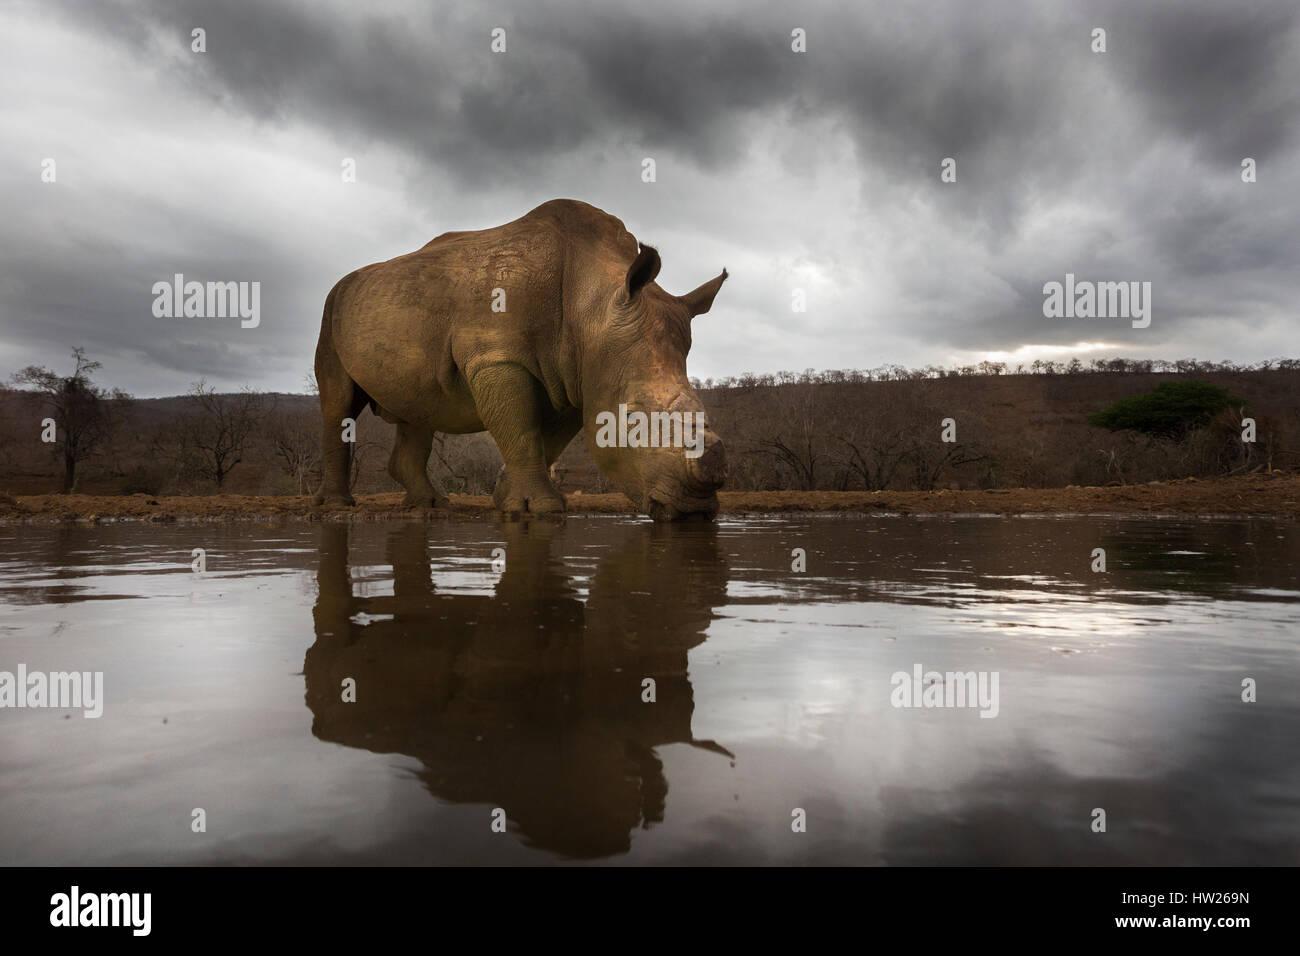 White Rhino (Ceratotherium simum) dehorned, Zimanga riserva privata, KwaZulu Natal, Sud Africa, Settembre 2016 Immagini Stock